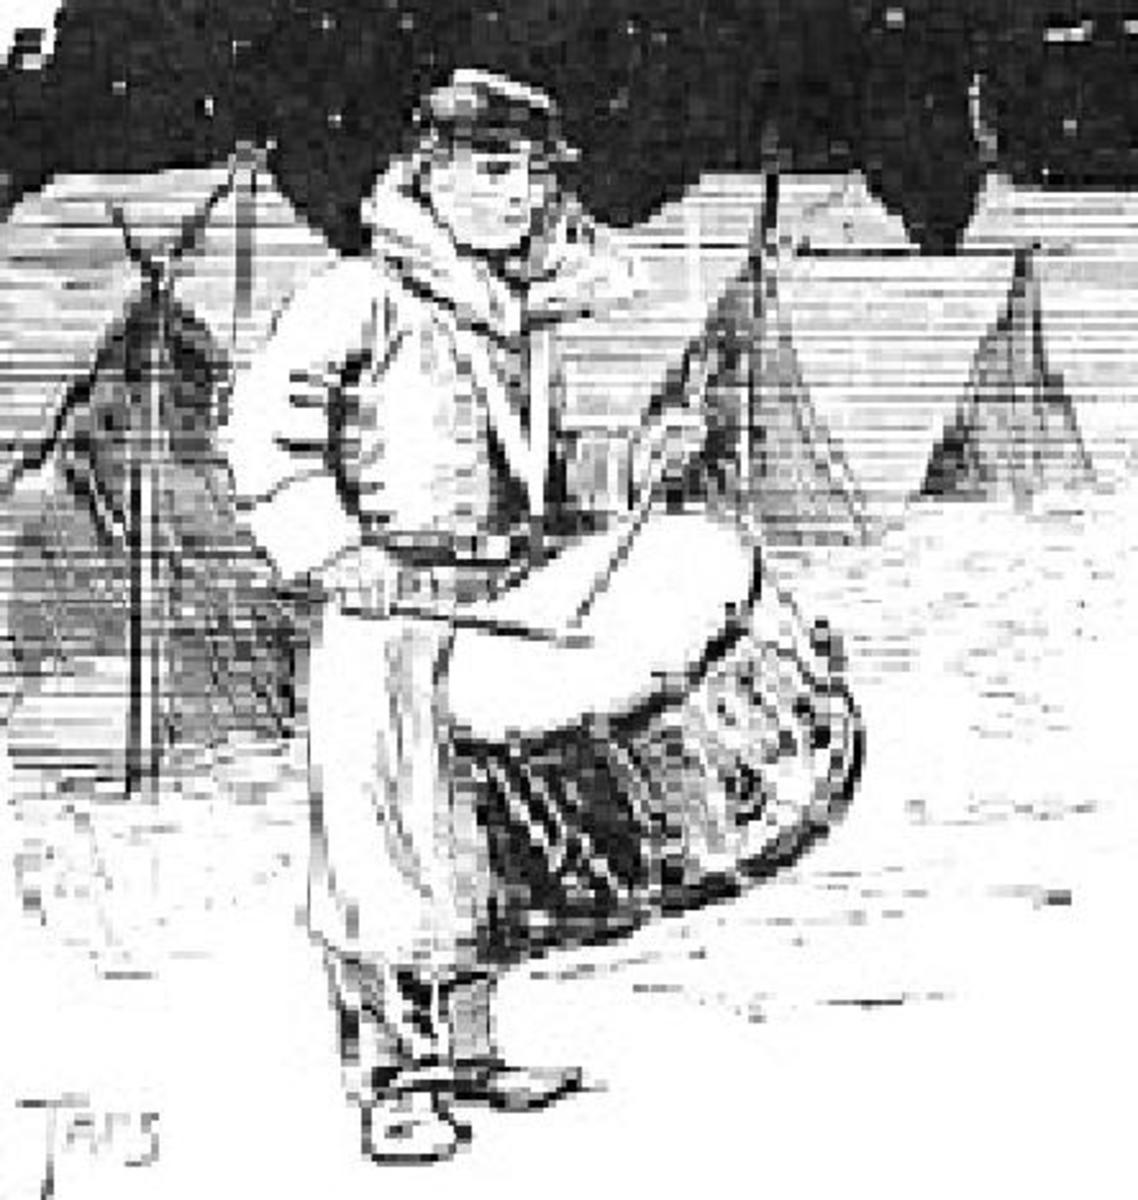 Sketch: a Union drummer boy plies his trade